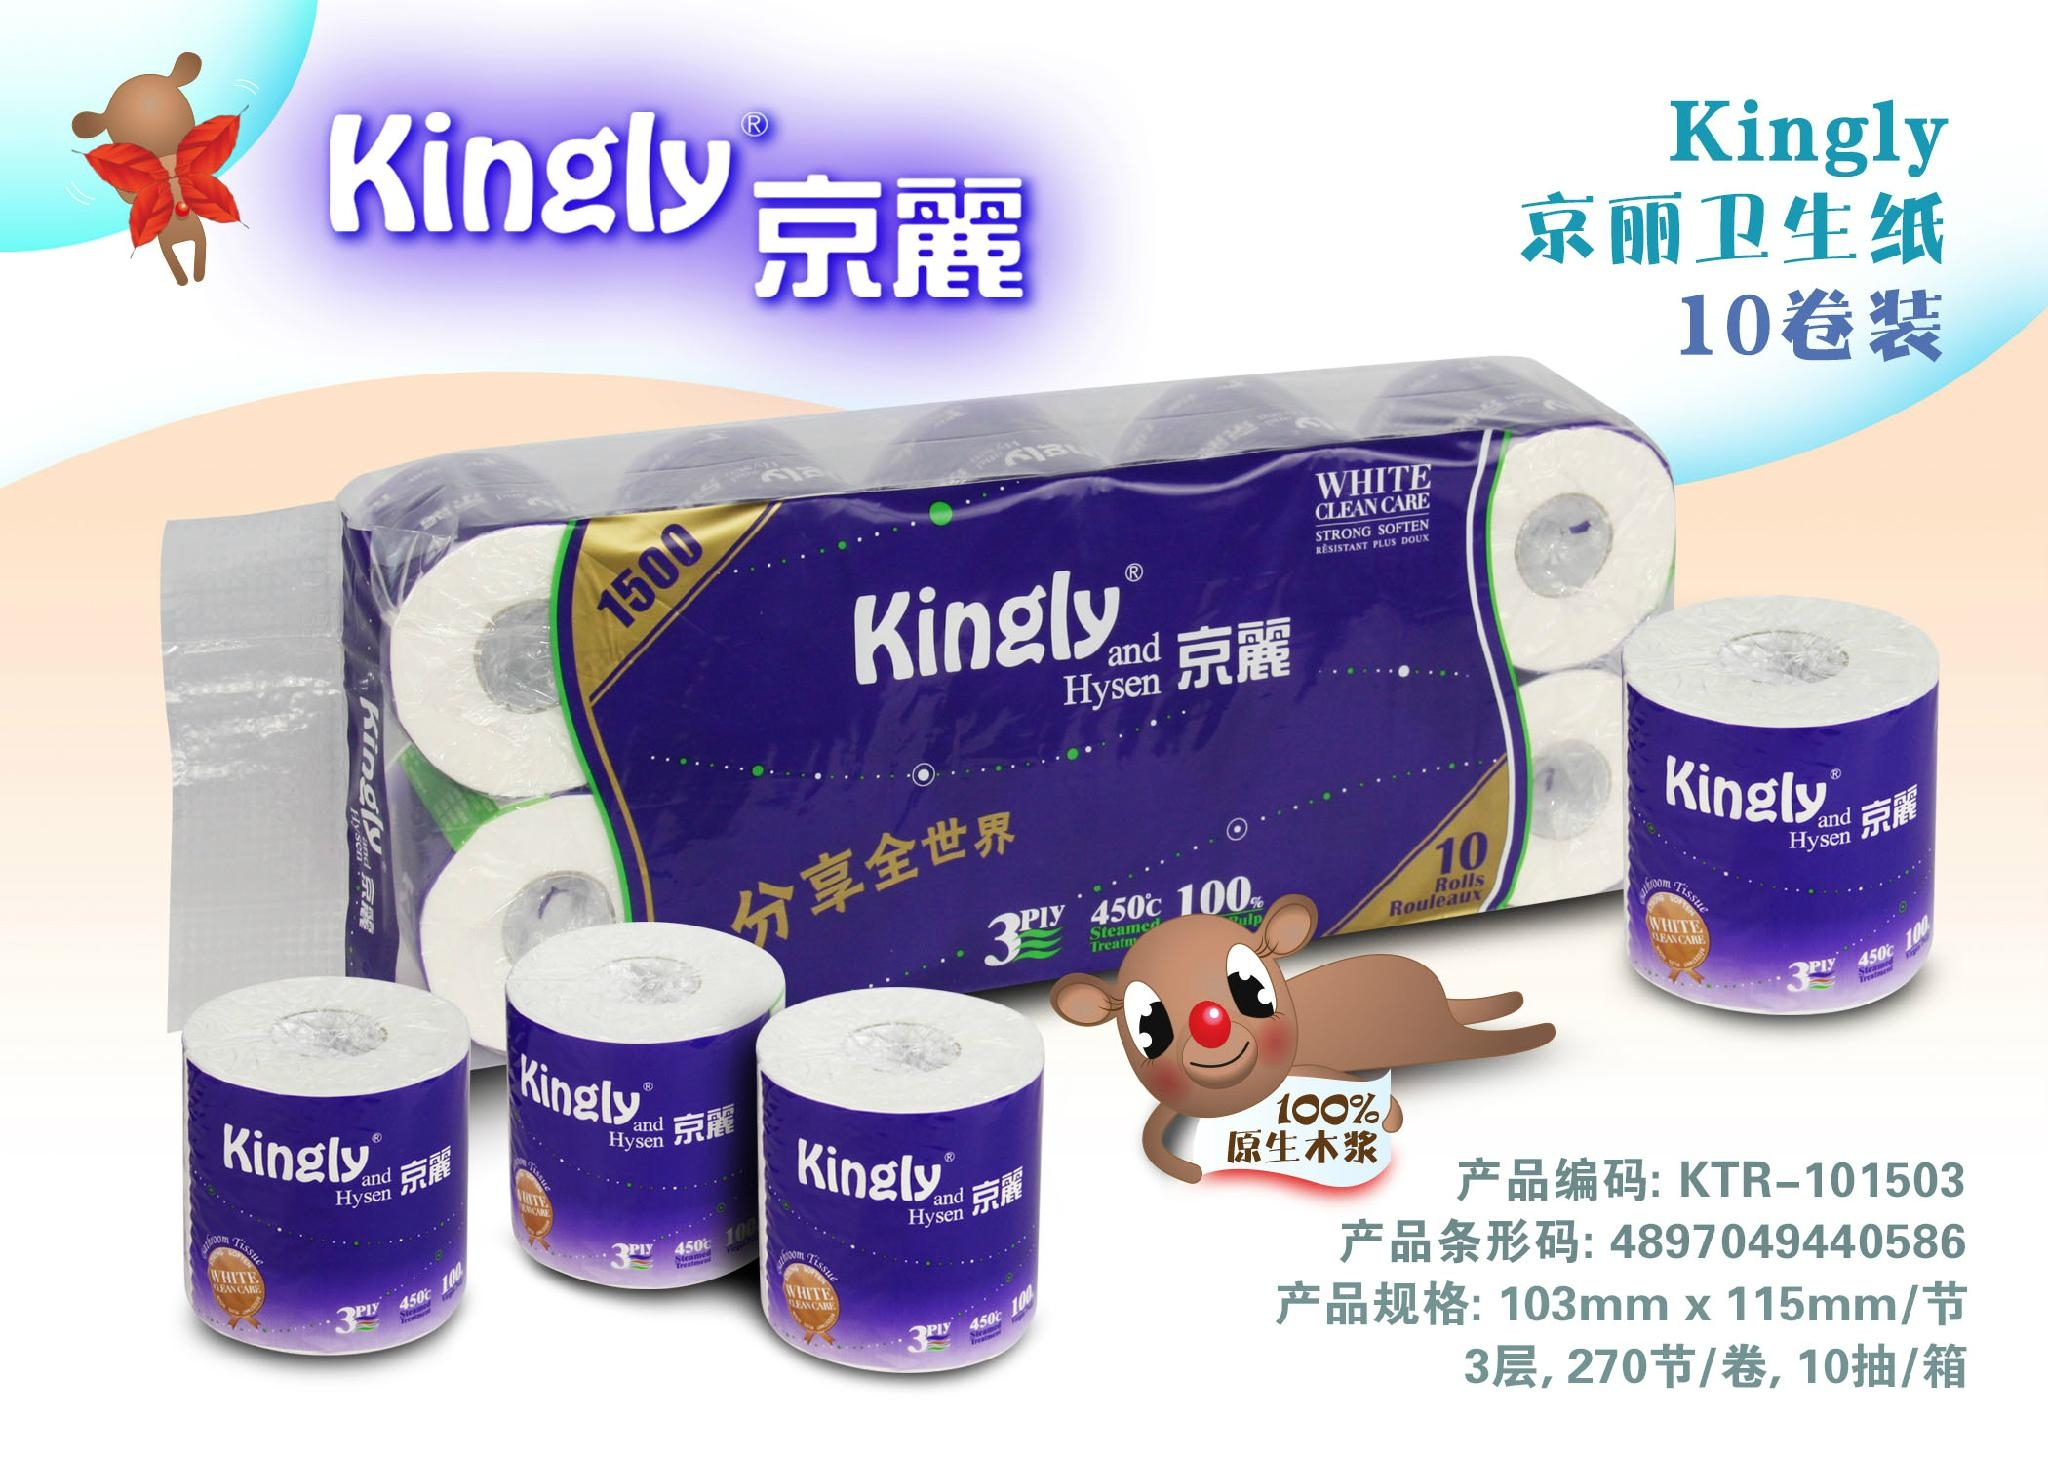 Toilet Paper - Kingly (Hong Kong Manufacturer) - Household ...